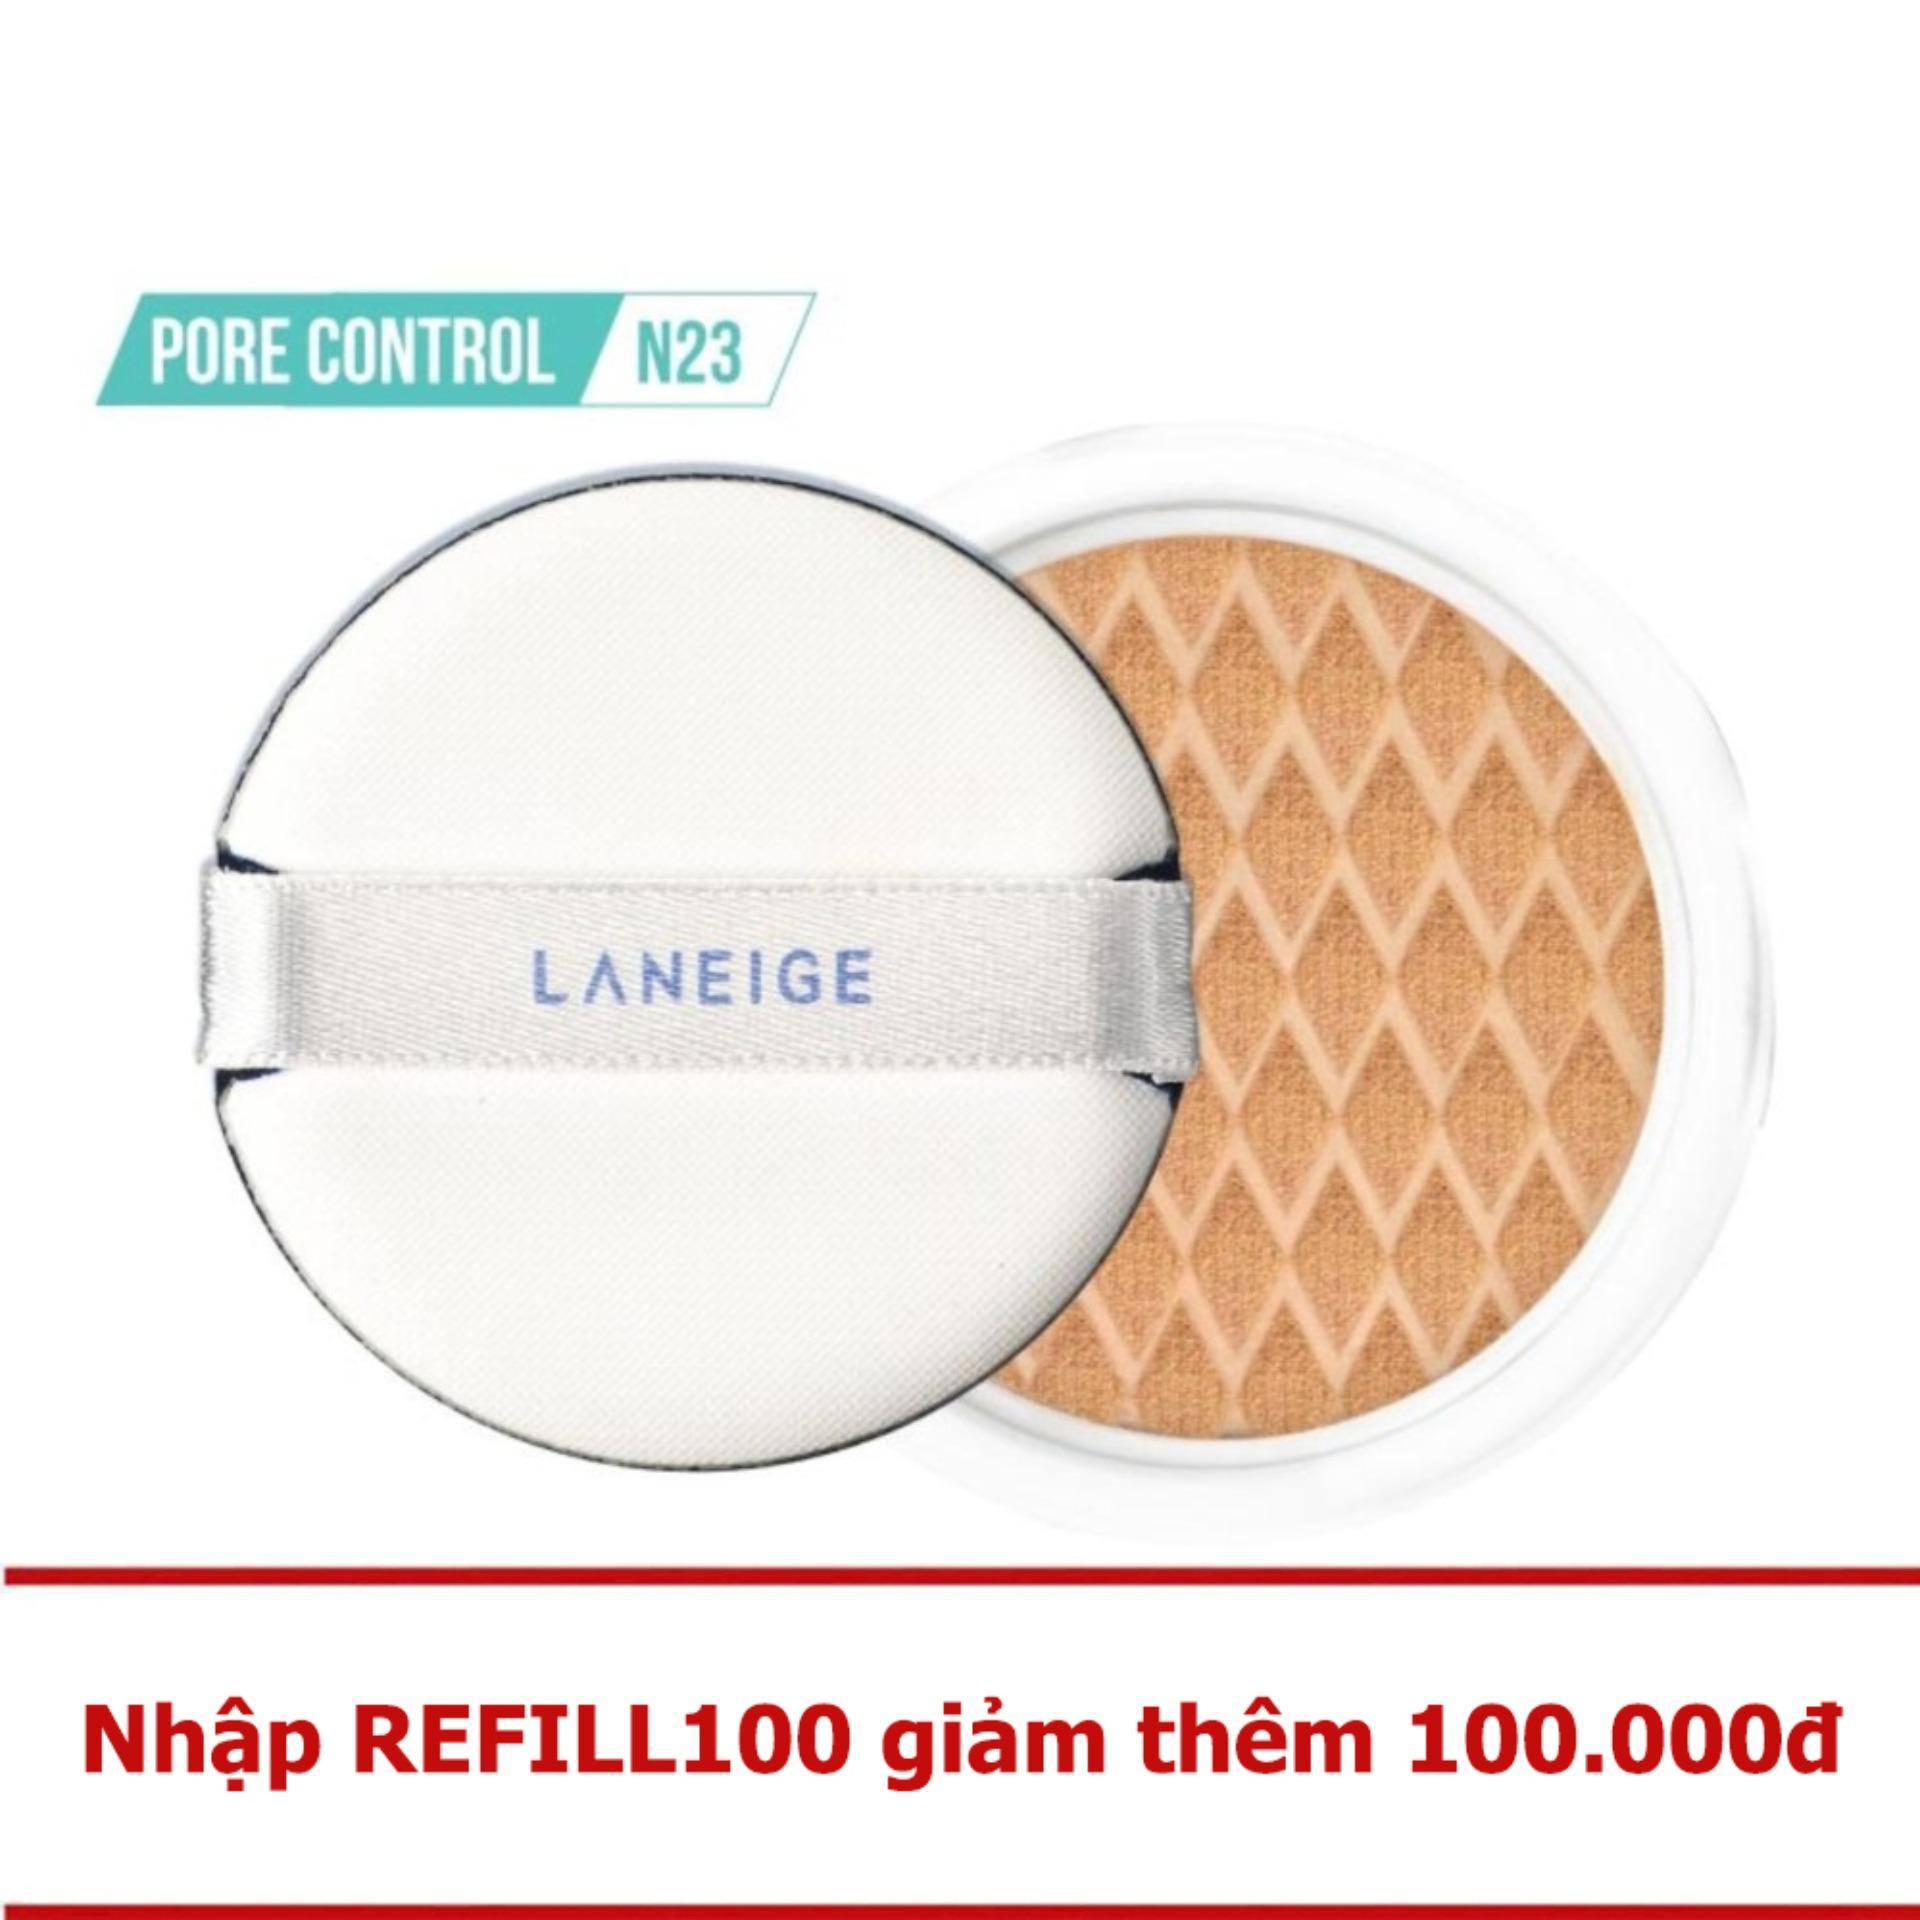 Ôn Tập Hot Deal Loi Kem Nền Kiềm Dầu Laneige Bb Cushion Pore Control Ex N23 15G Trong Hồ Chí Minh